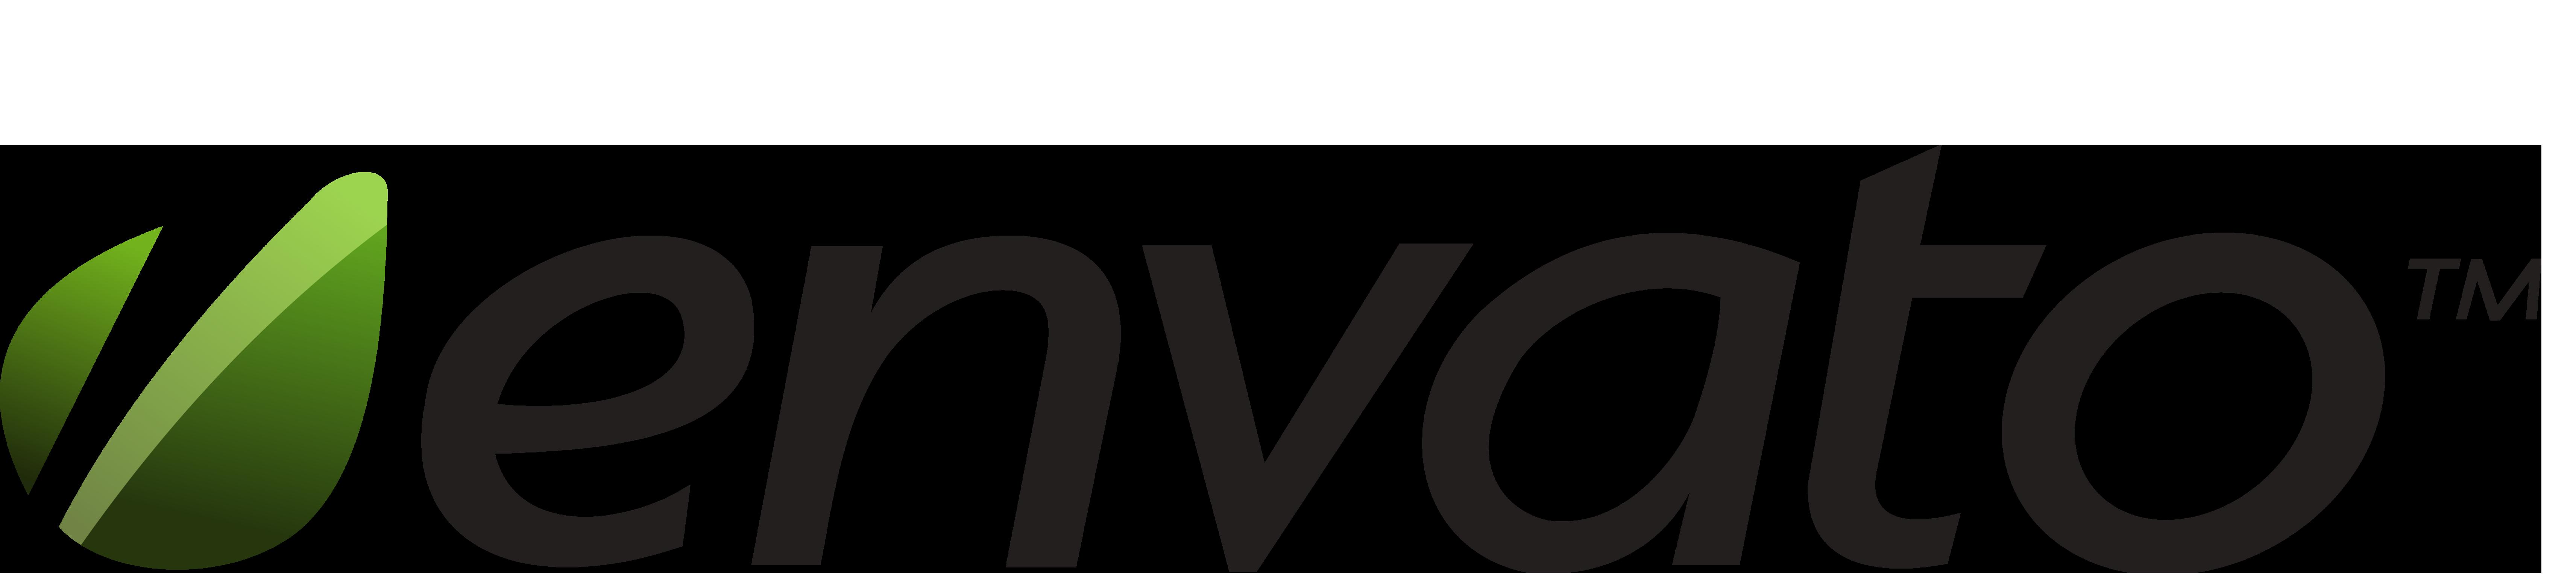 empresas relacionadas con WordPress - Envato